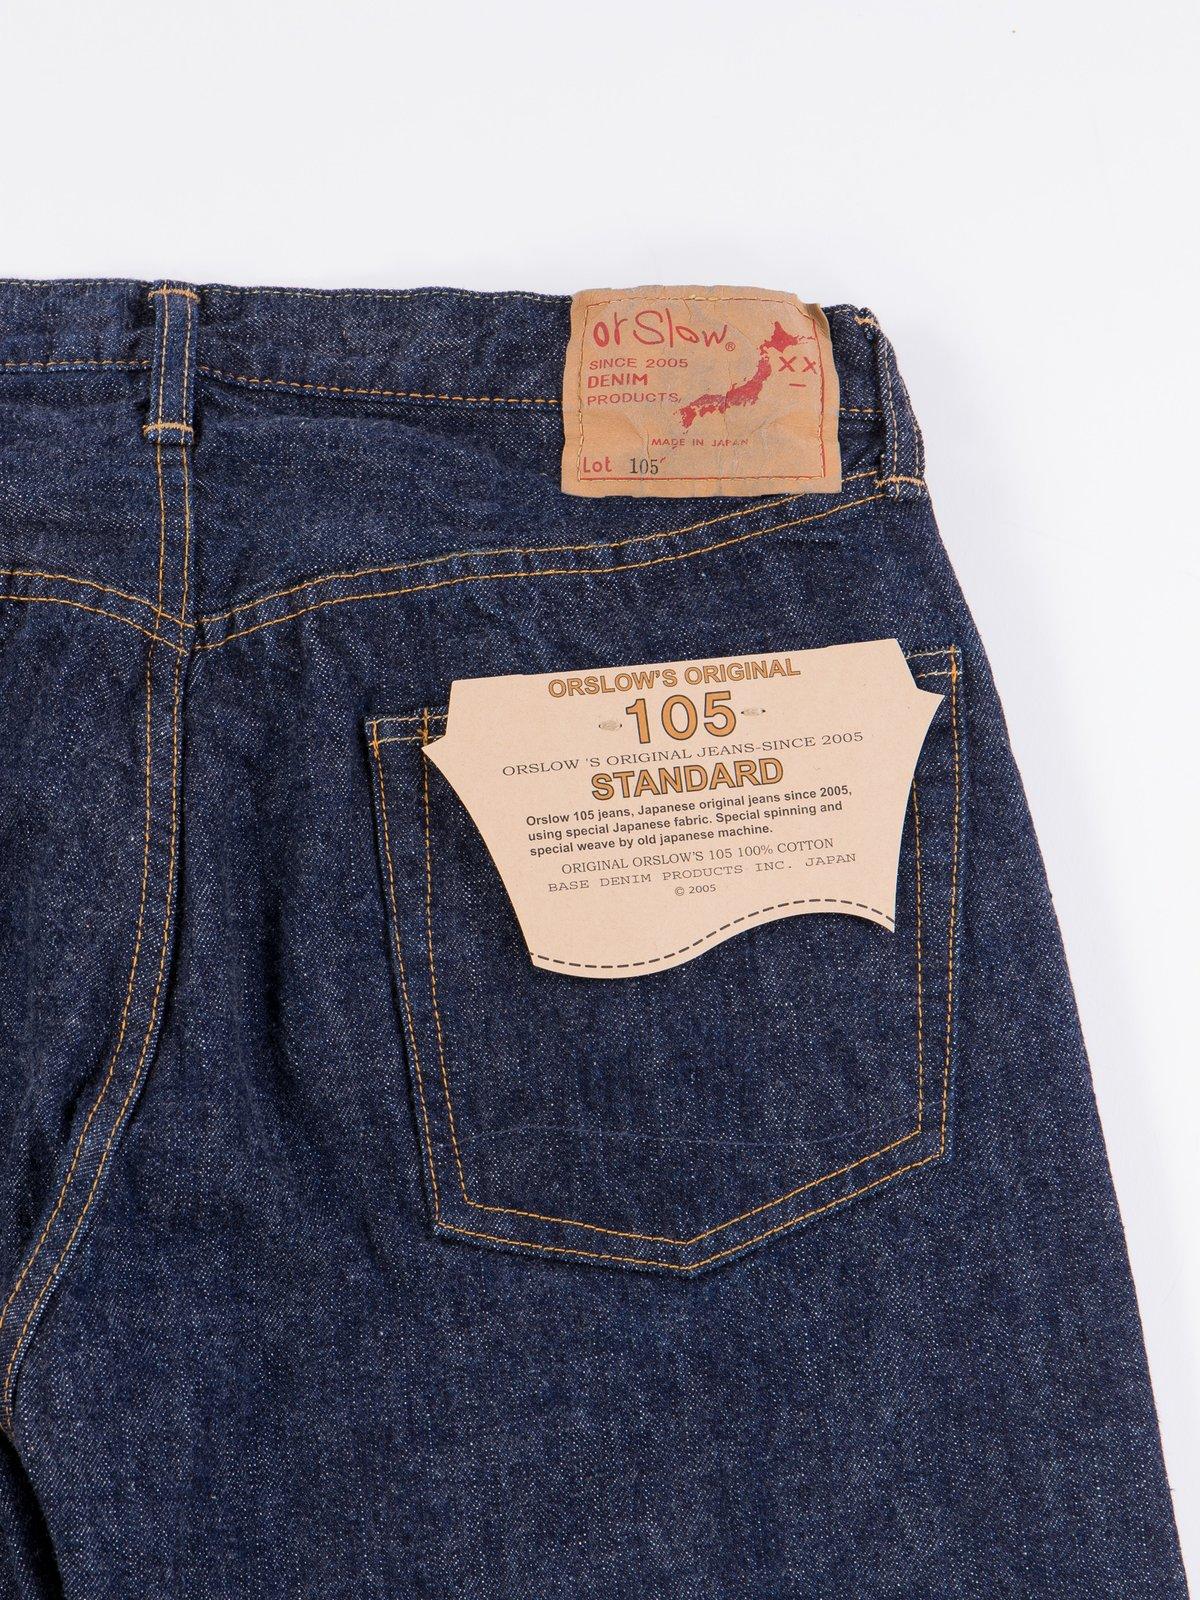 Indigo One Wash 105 Standard 5 Pocket Jean - Image 7